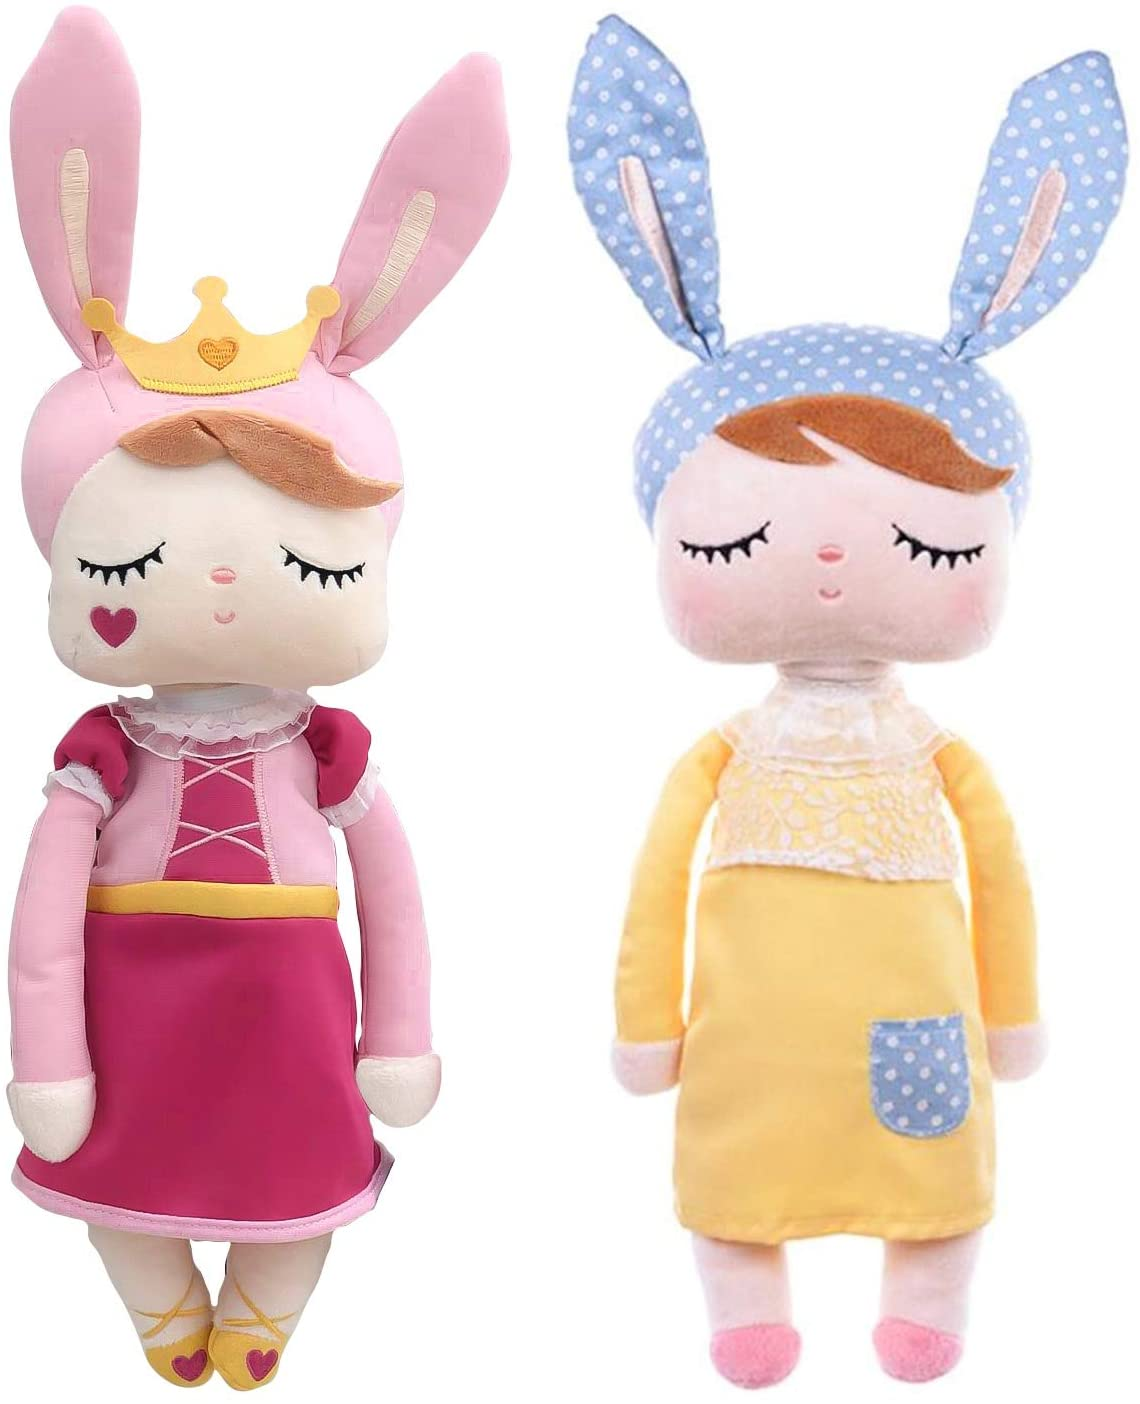 2 MeToo Doll Angela Vintage Super Soft Plush Stuffed Bunny Doll Baby Girl Rabbit Retro Style I Kids Idea I Baby Girl's Sleeping Partner I Best Friend (Princess - Yellow)